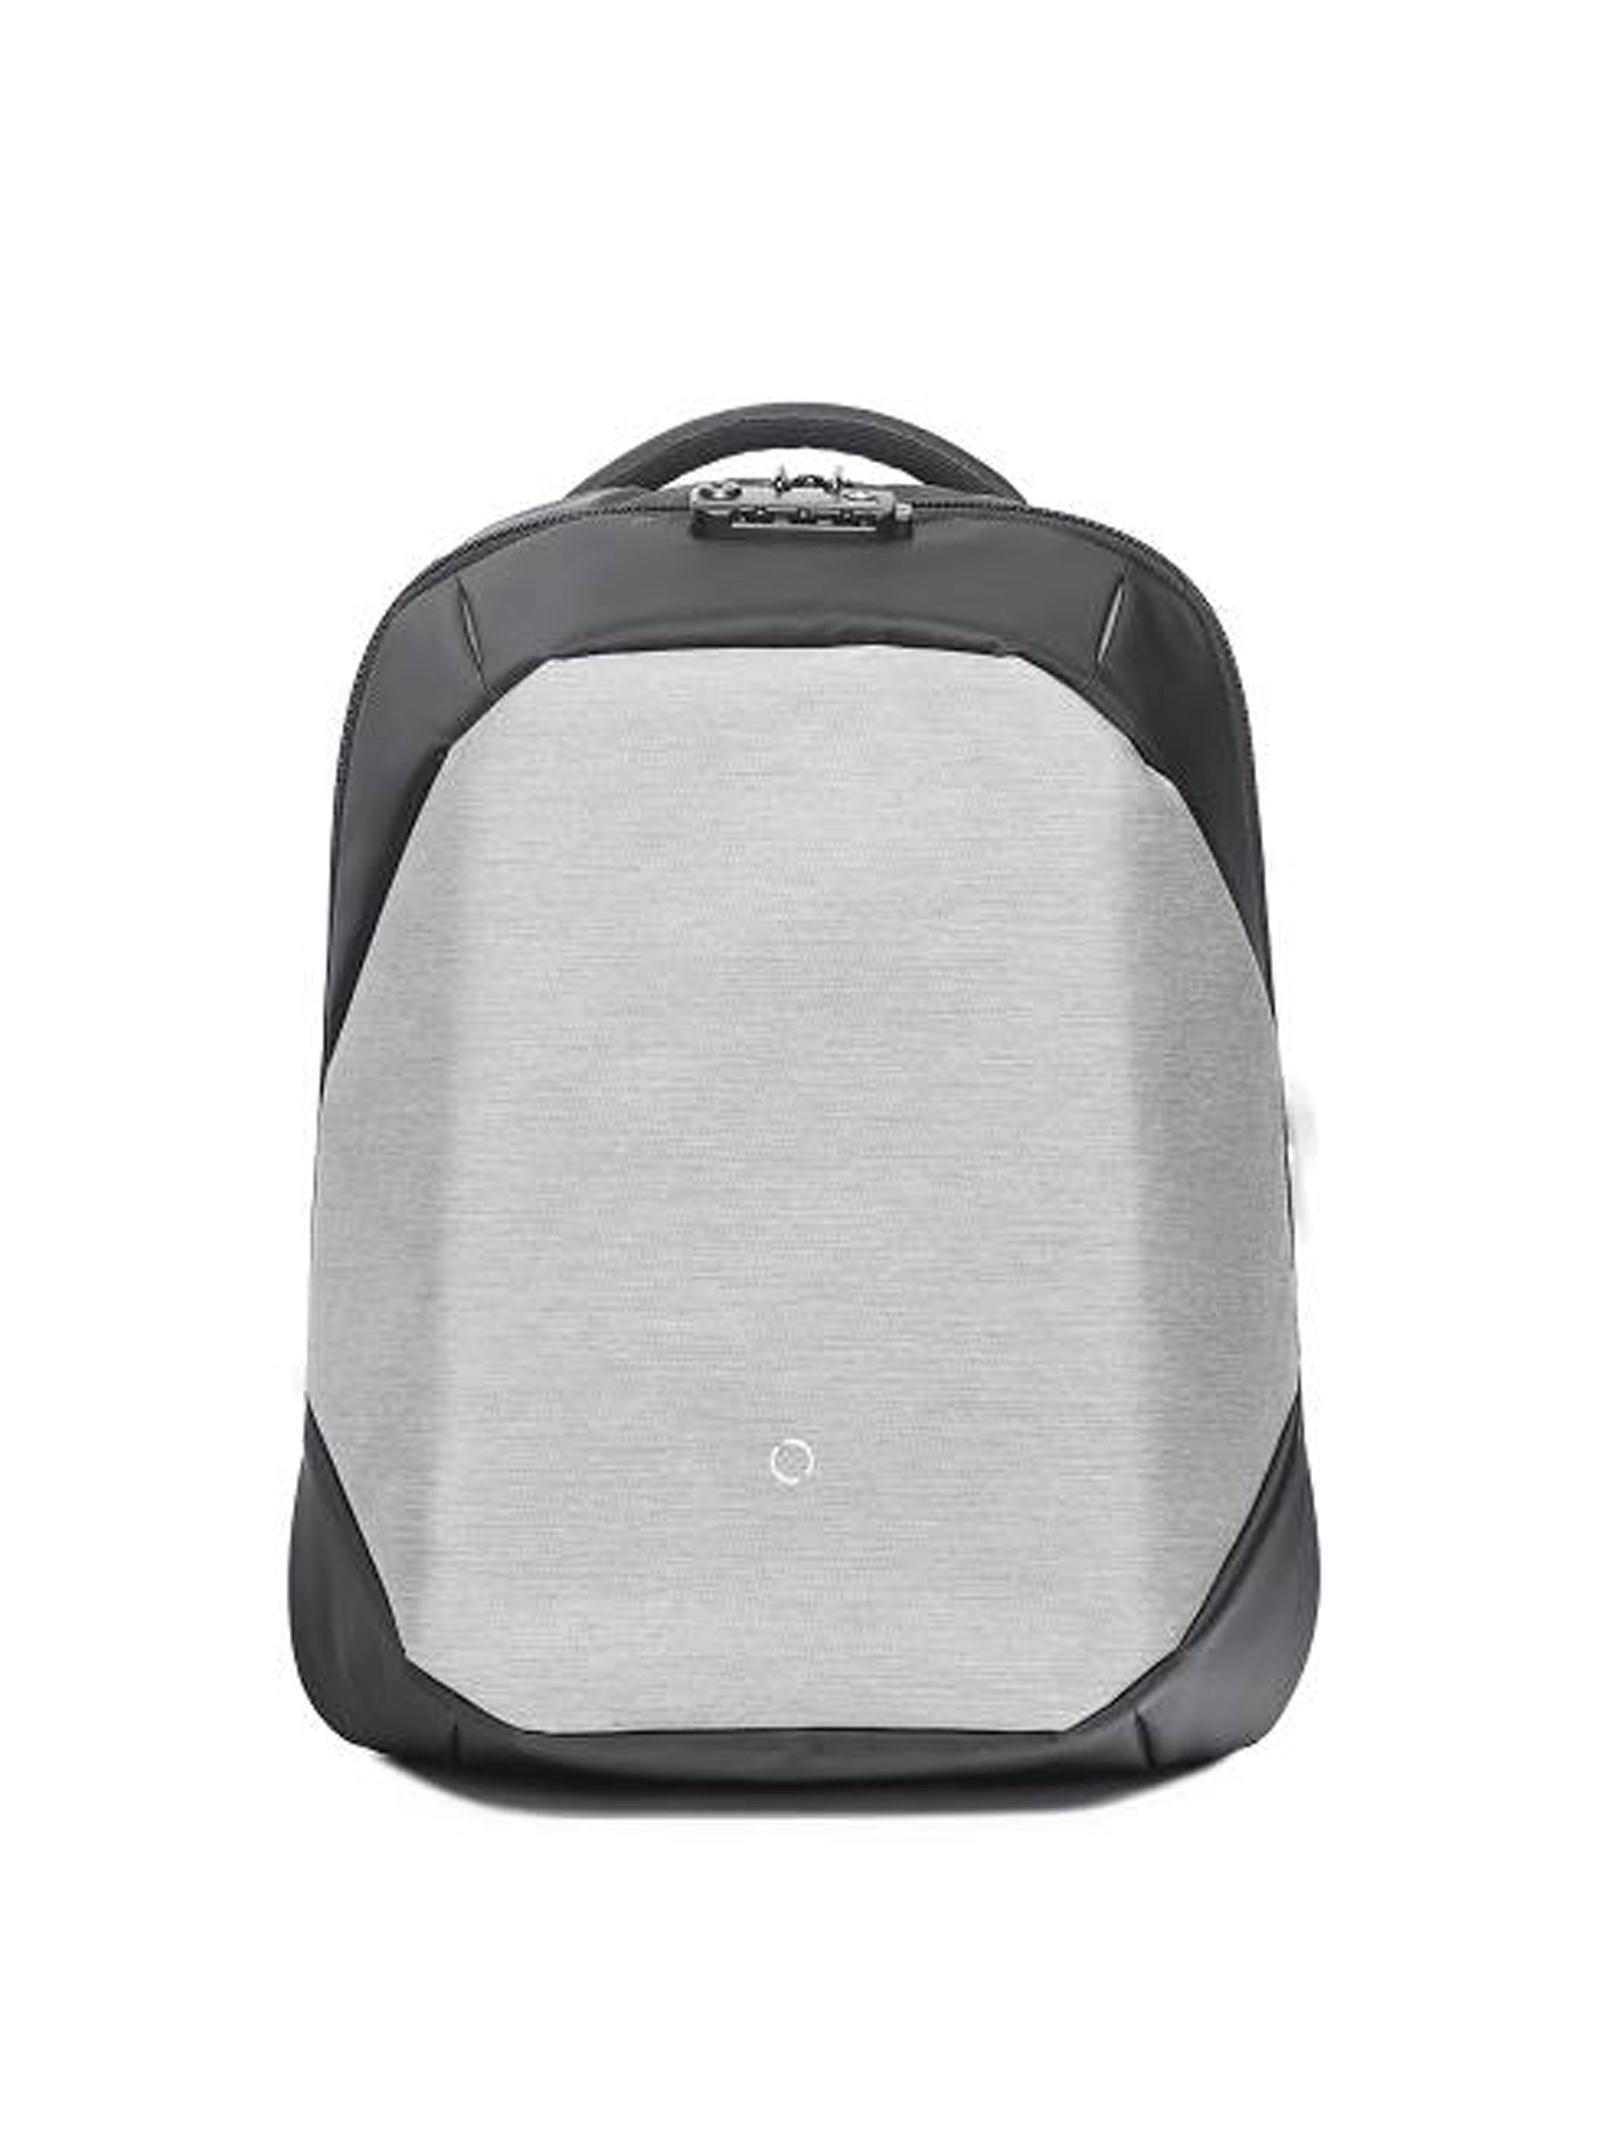 Рюкзак KORIN ClickPack Basic, серый рюкзак korin design clickpack gray серый